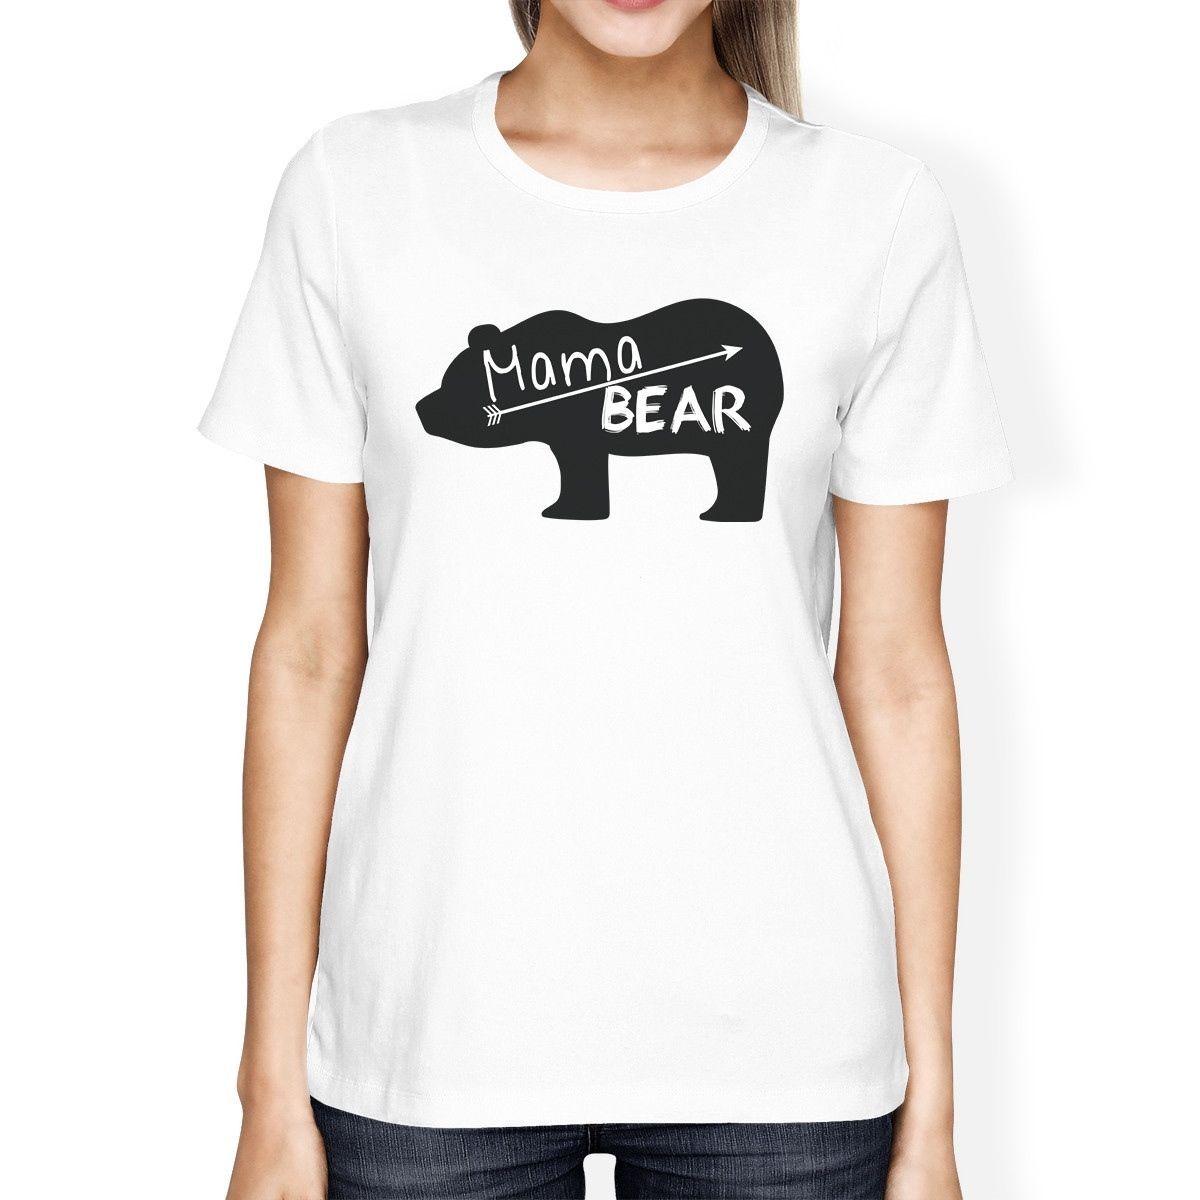 c2ab7800b1ca Women S Tee Mama Bear Women S White Short Sleeve Tee Trendy Design Graphic  Top T Shirt Women Summer Harajuku Punk Hipster T Shirt Tops Tee T Shirt  Sites ...